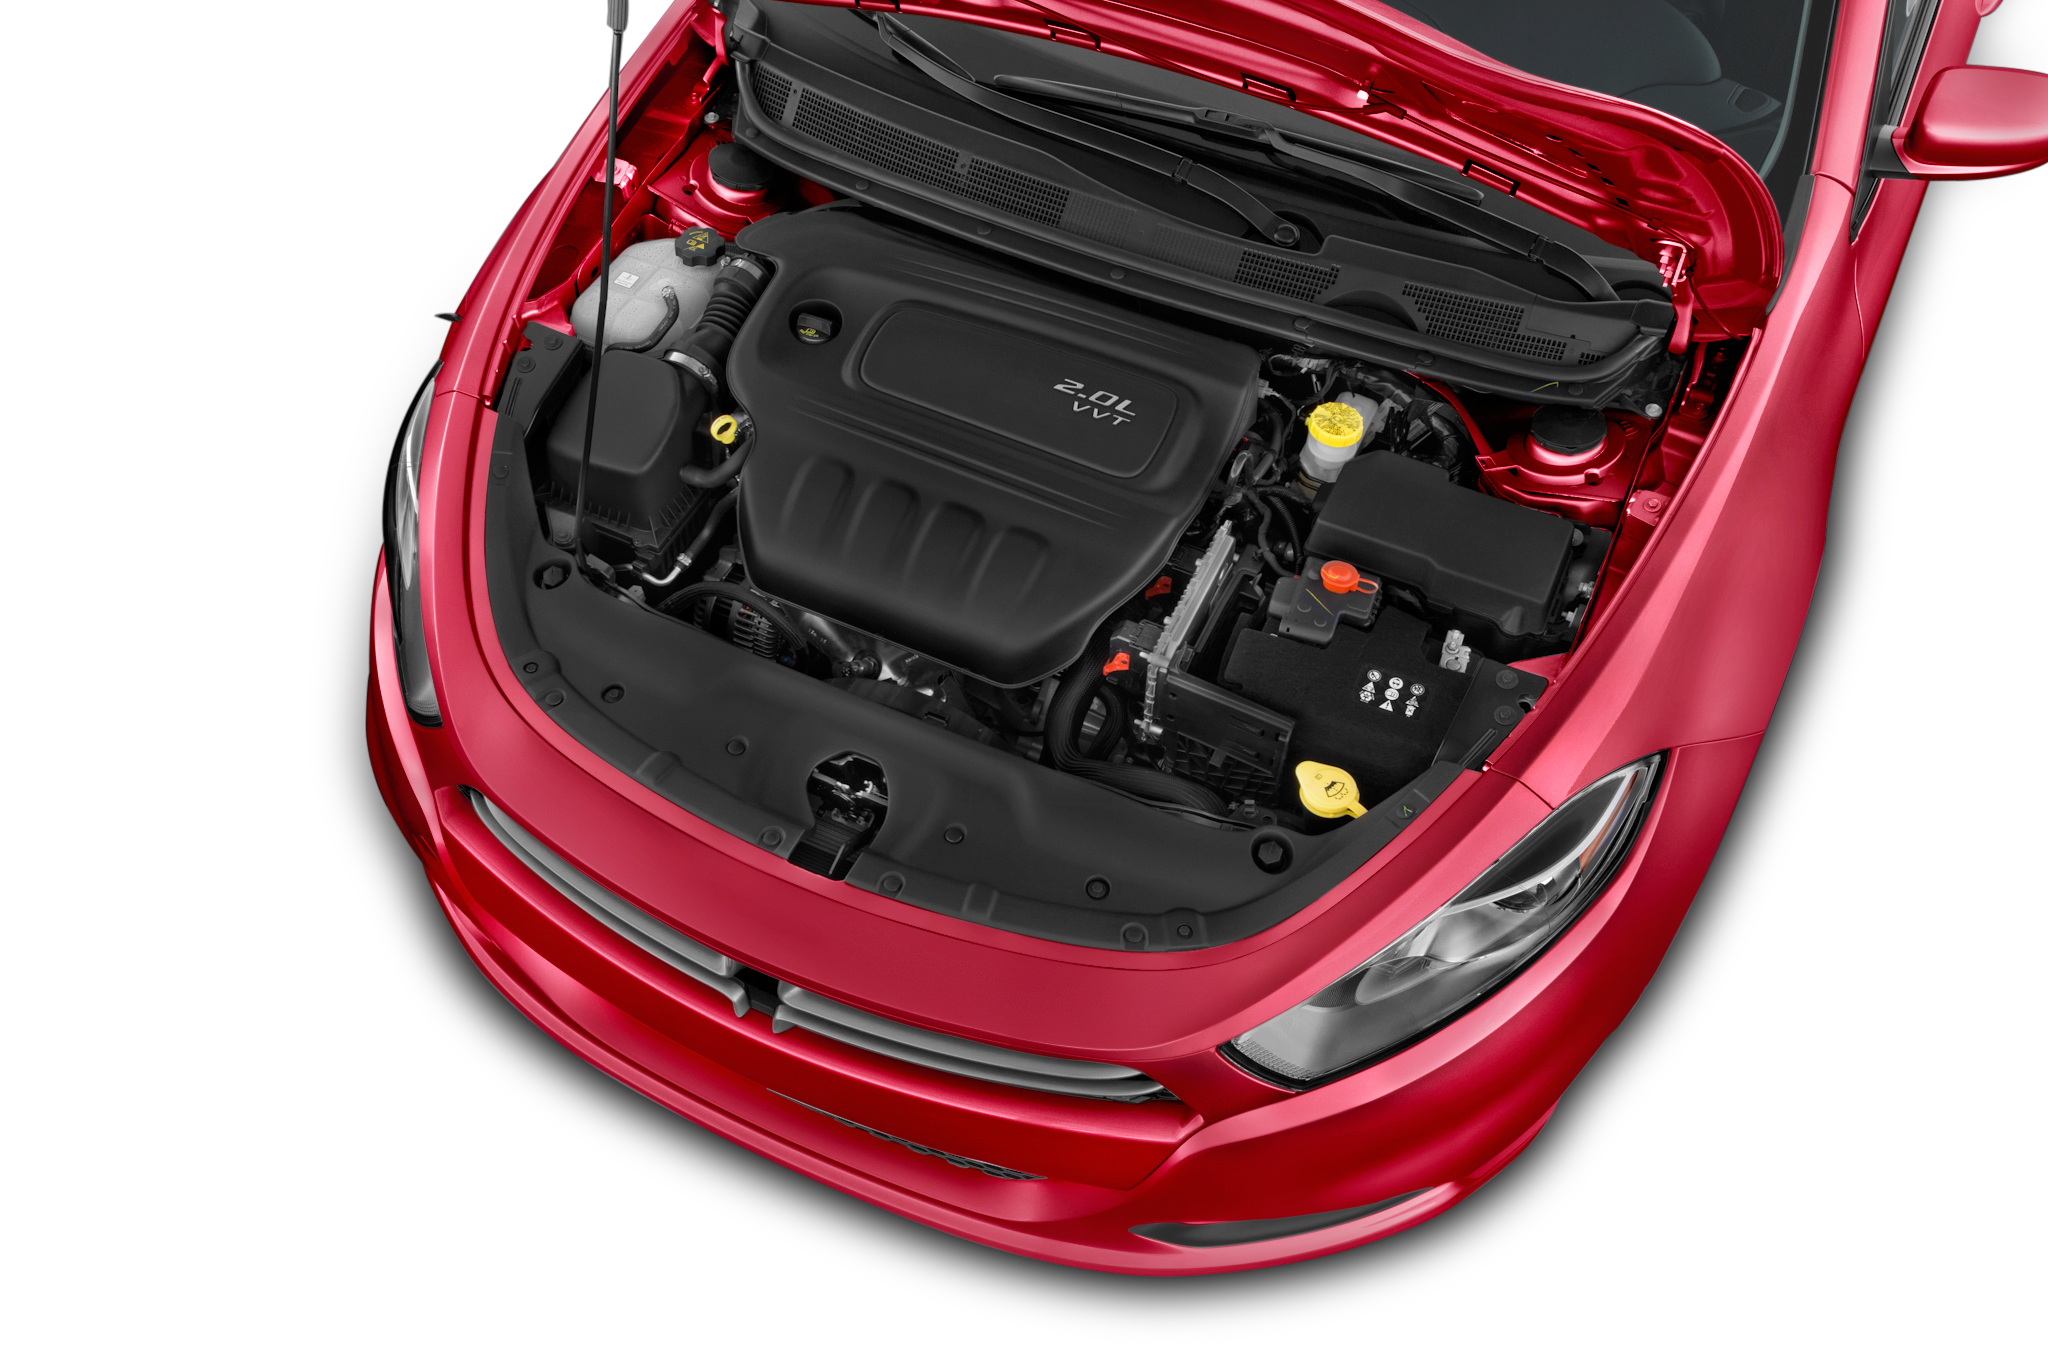 2014 Dodge Dart Blacktop Debuts For Detroit Auto Show Grand Caravan Engine 54 93